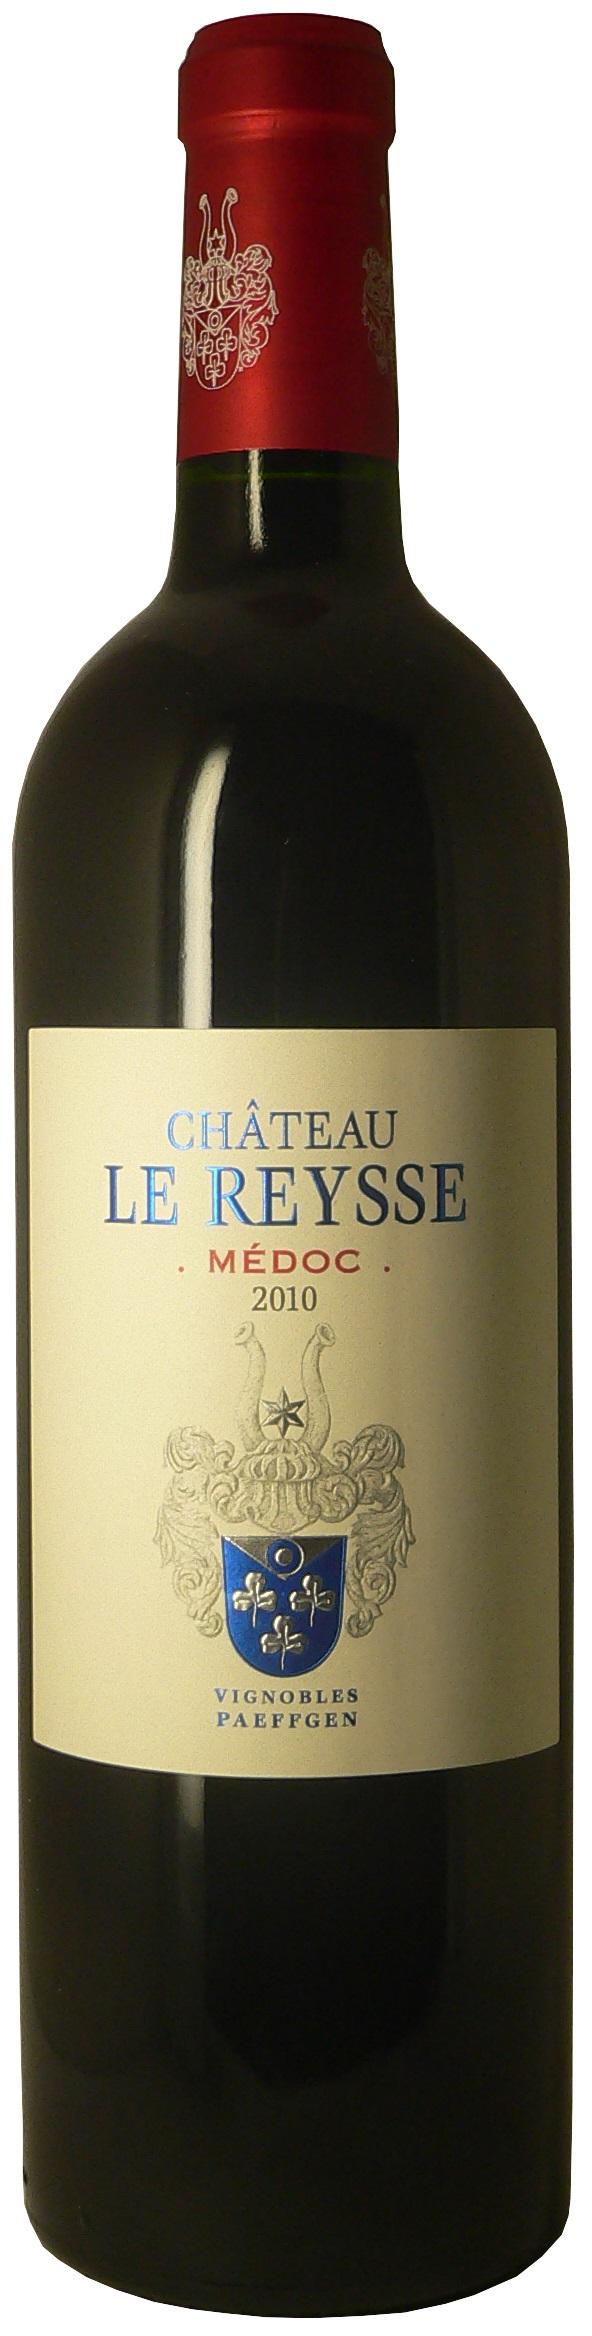 2012 Château Le Reysse AOC Medoc Magnum